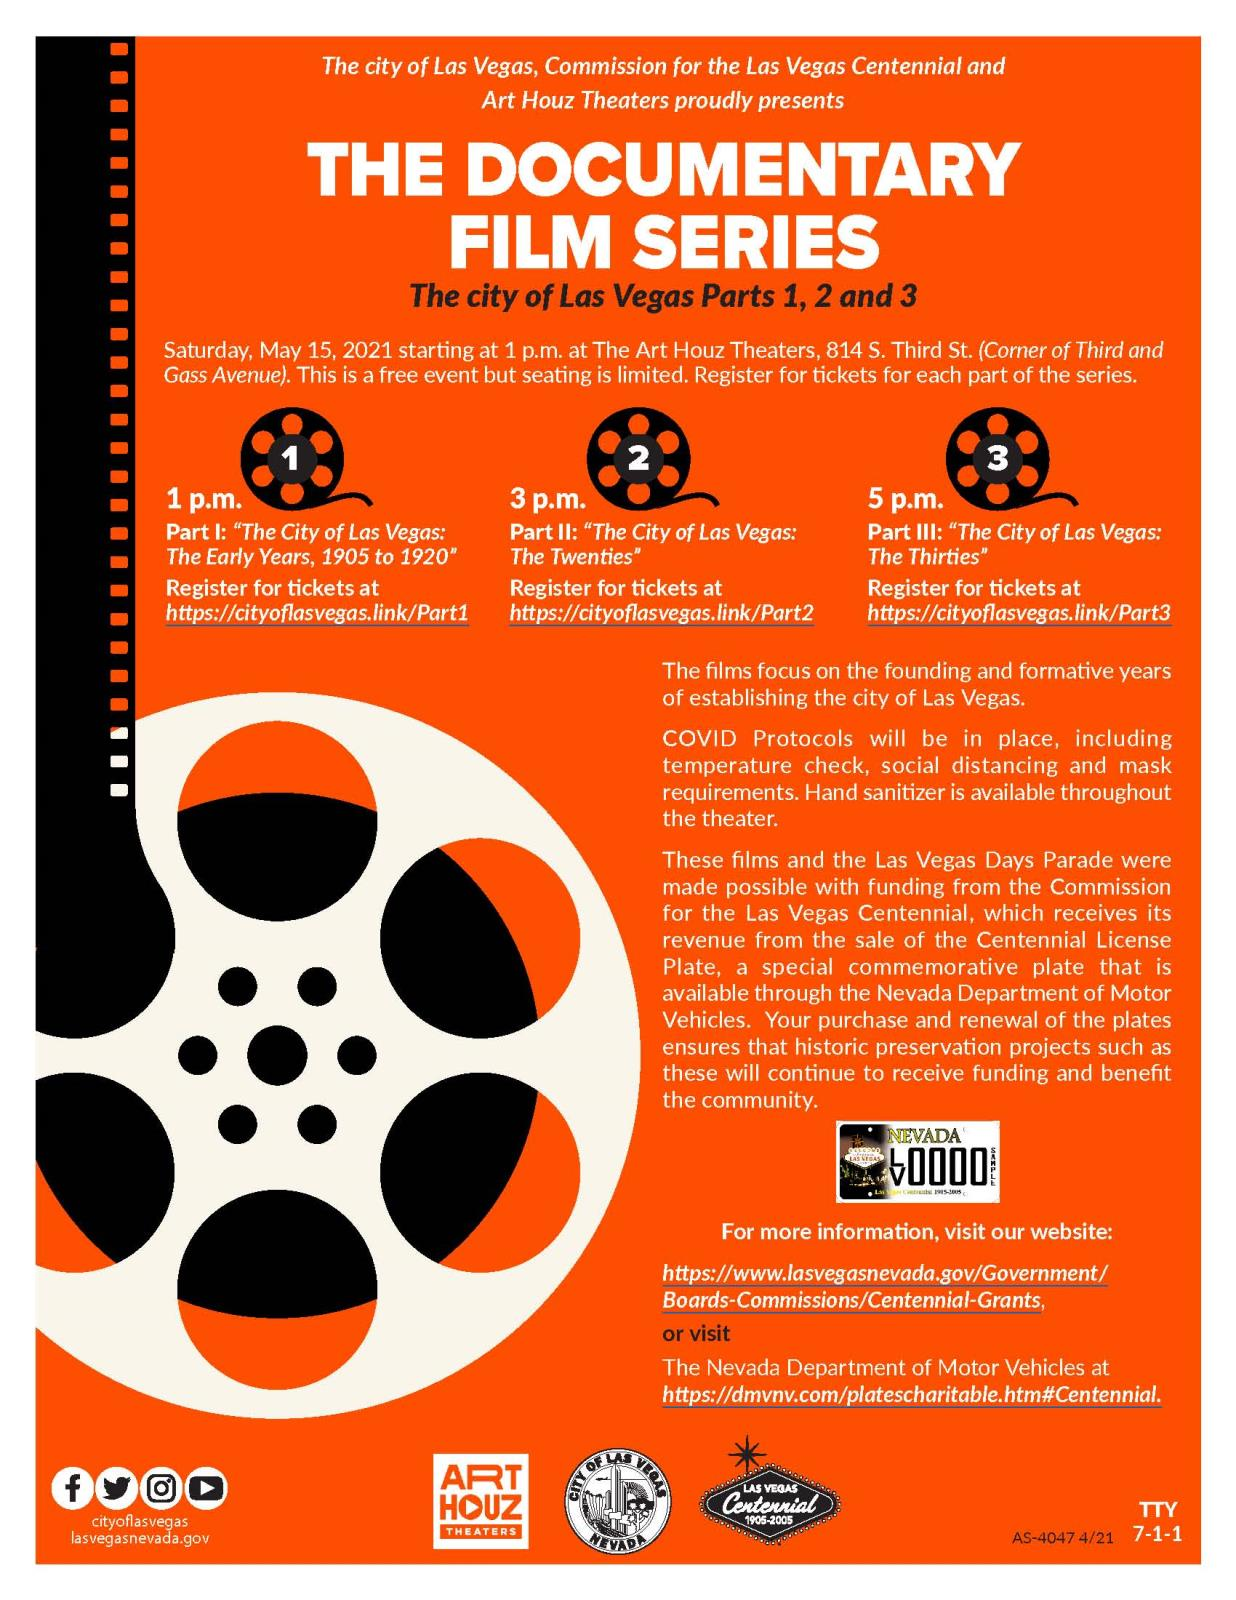 CLV-Part-3-Documentary-Movie-flyer-2021.jpg